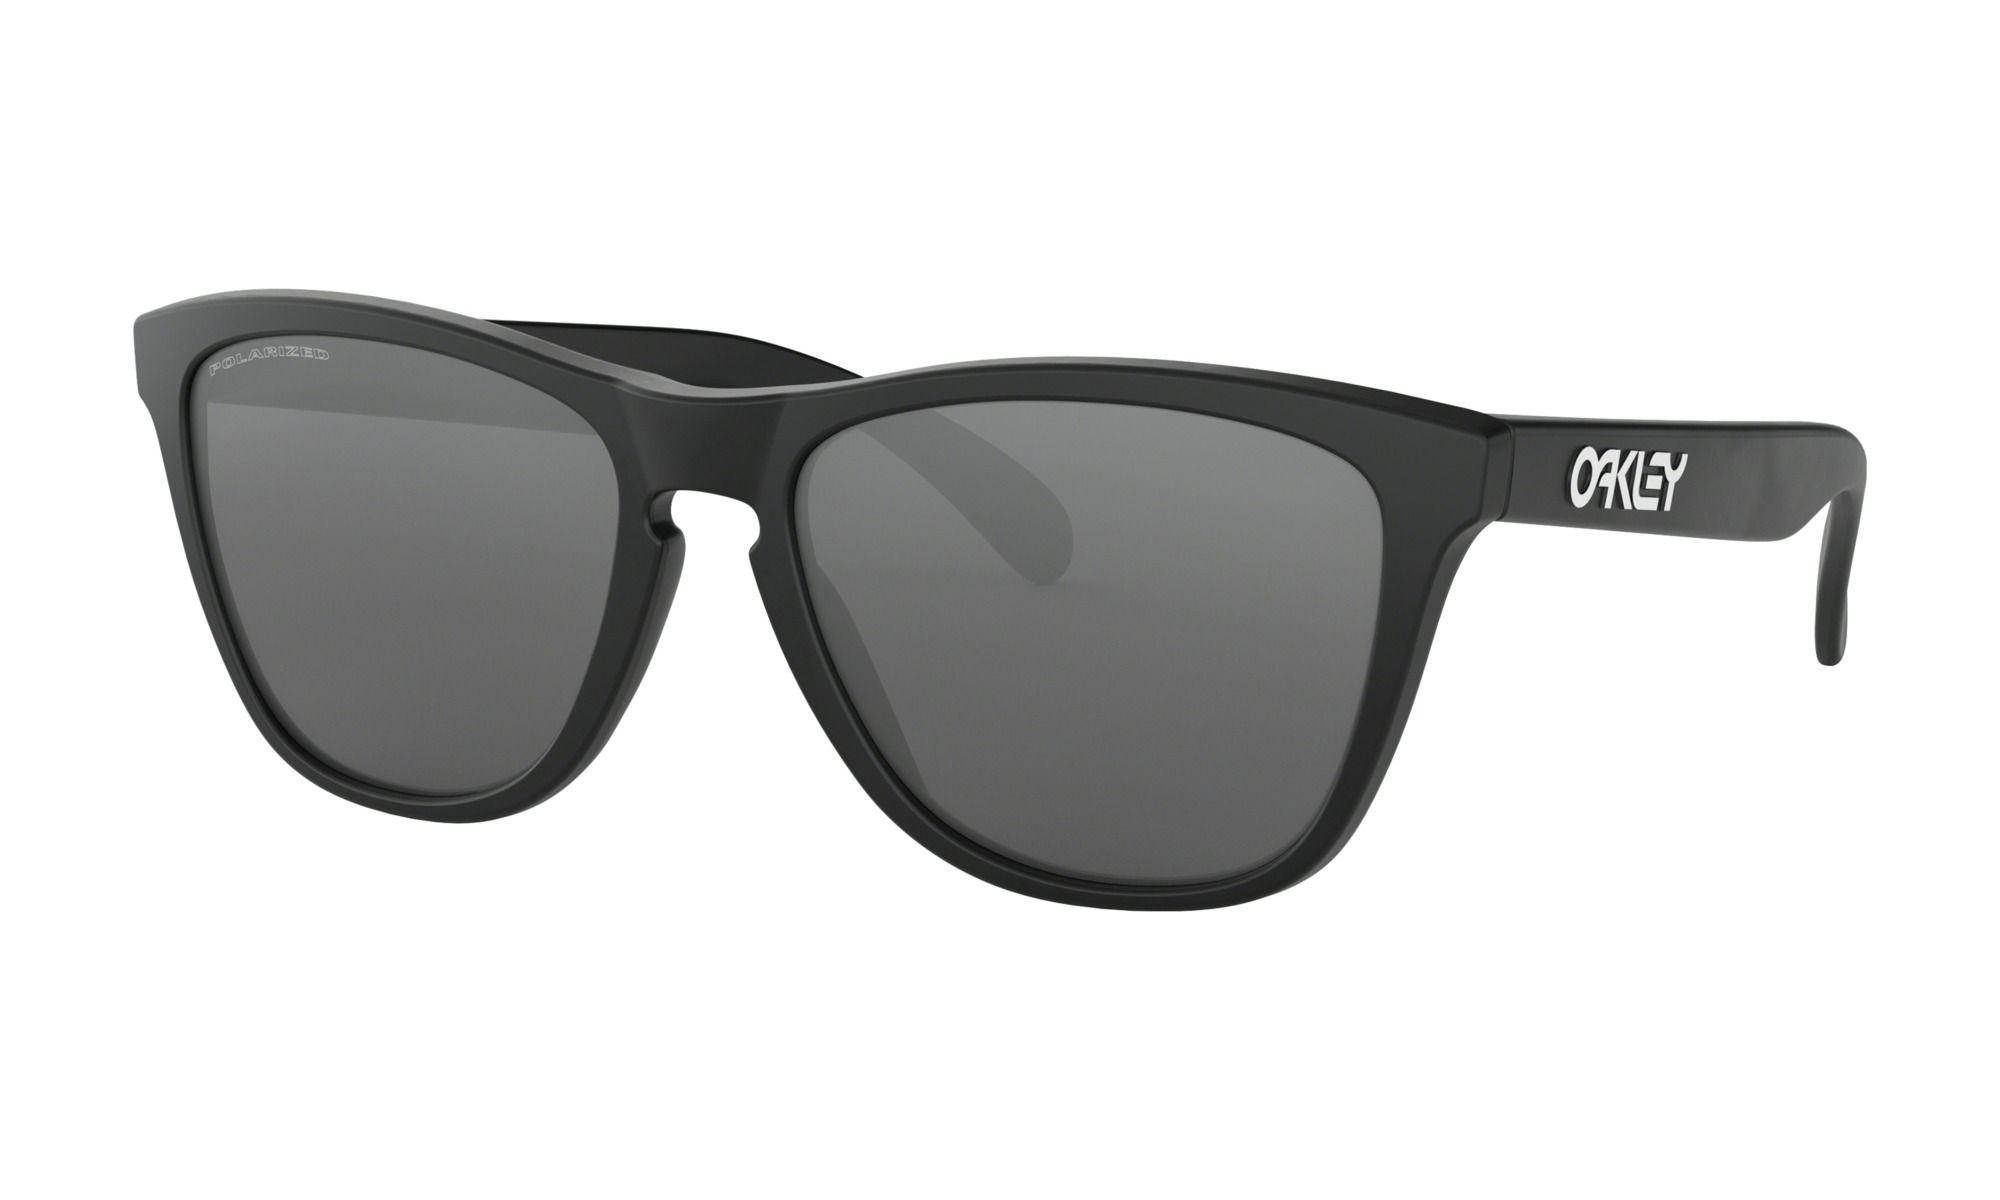 Óculos Oakley Frogskins Matte Black Iridium Plrzd